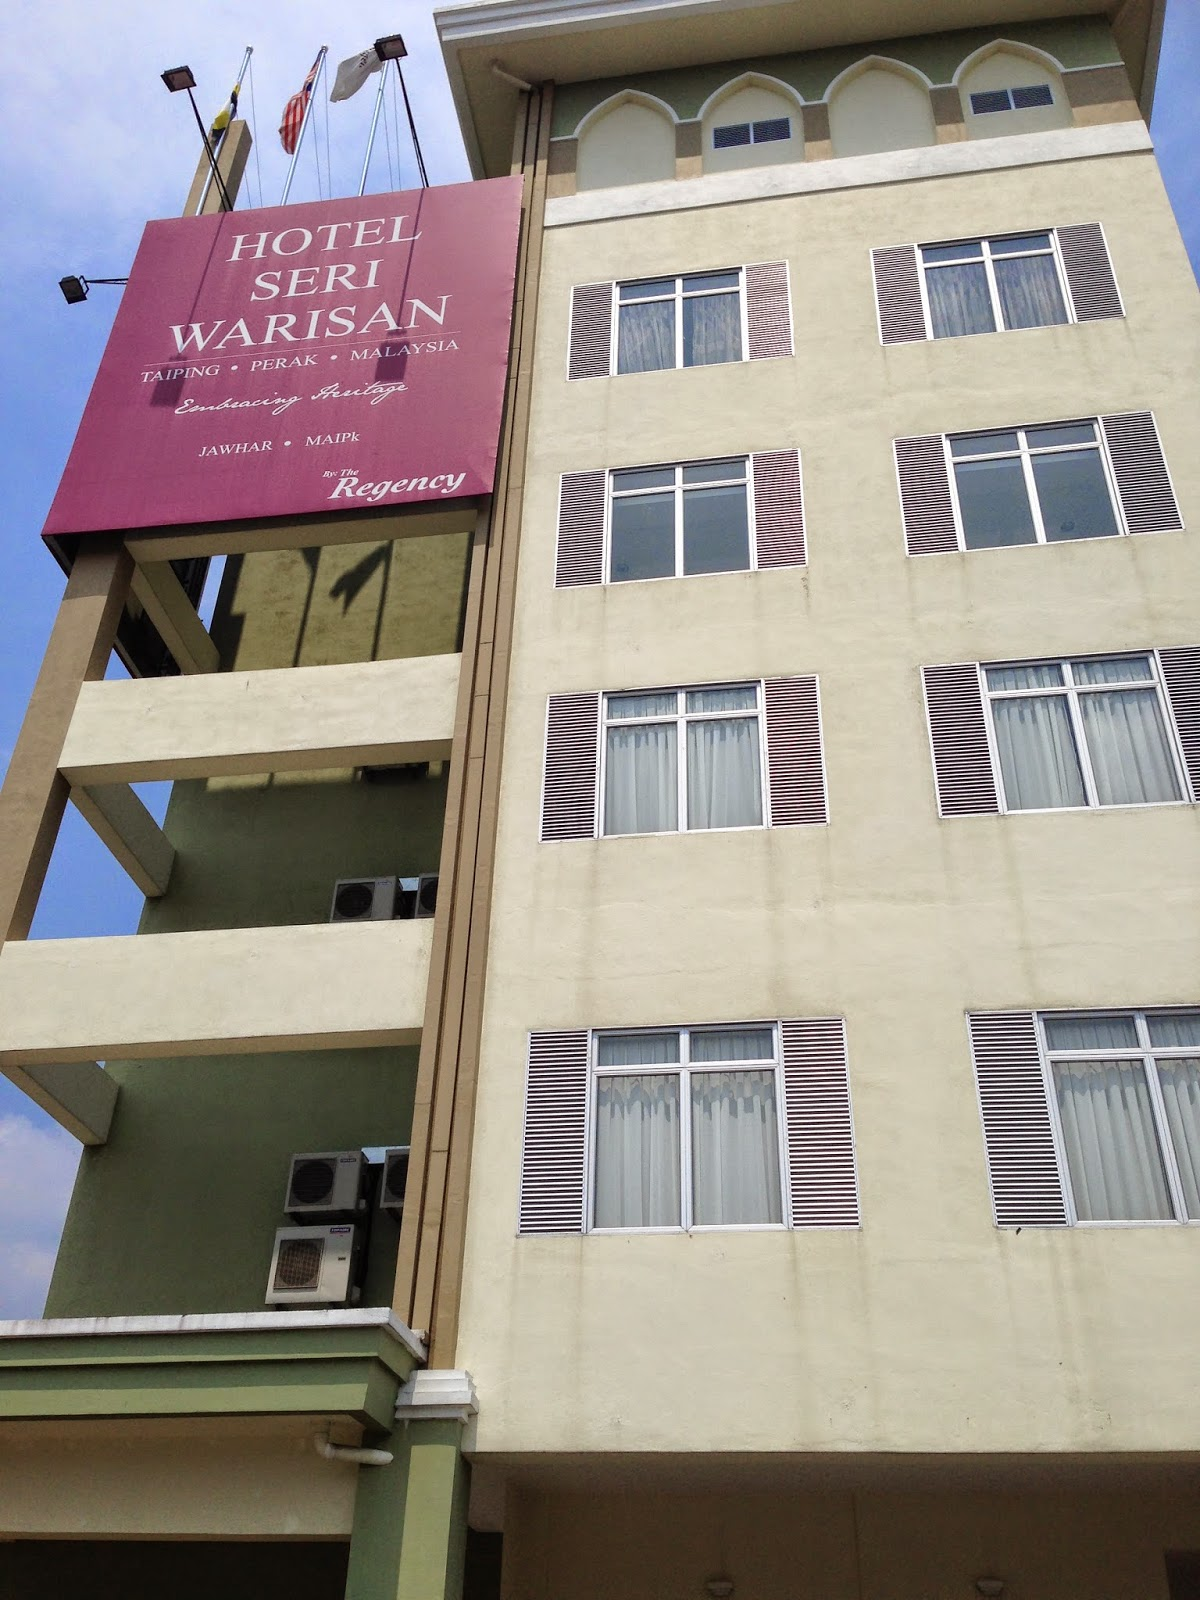 Hotel Seri Warisan Regency